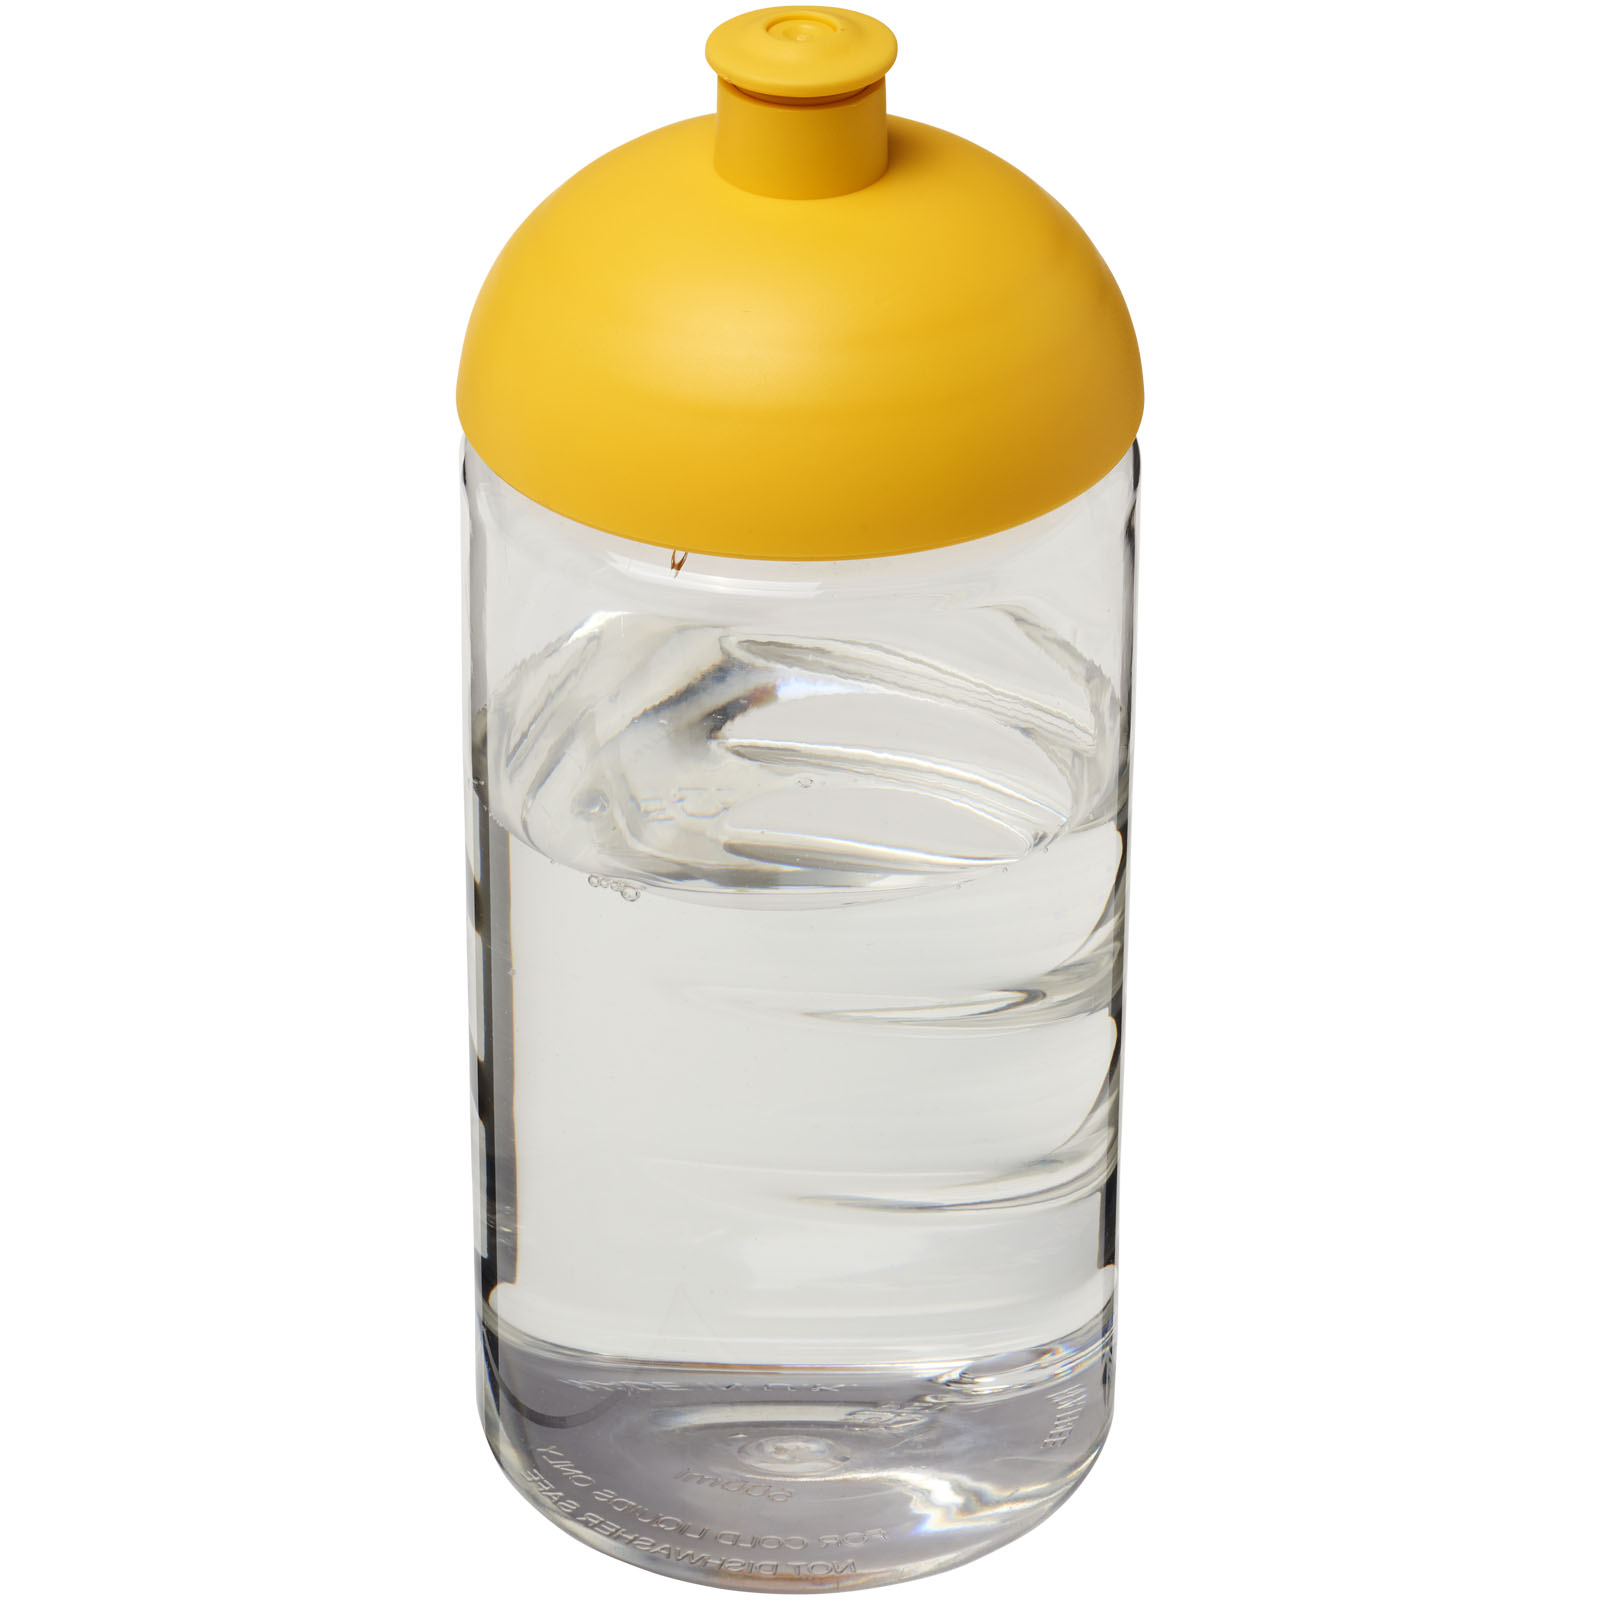 Plastic water bottle mockups